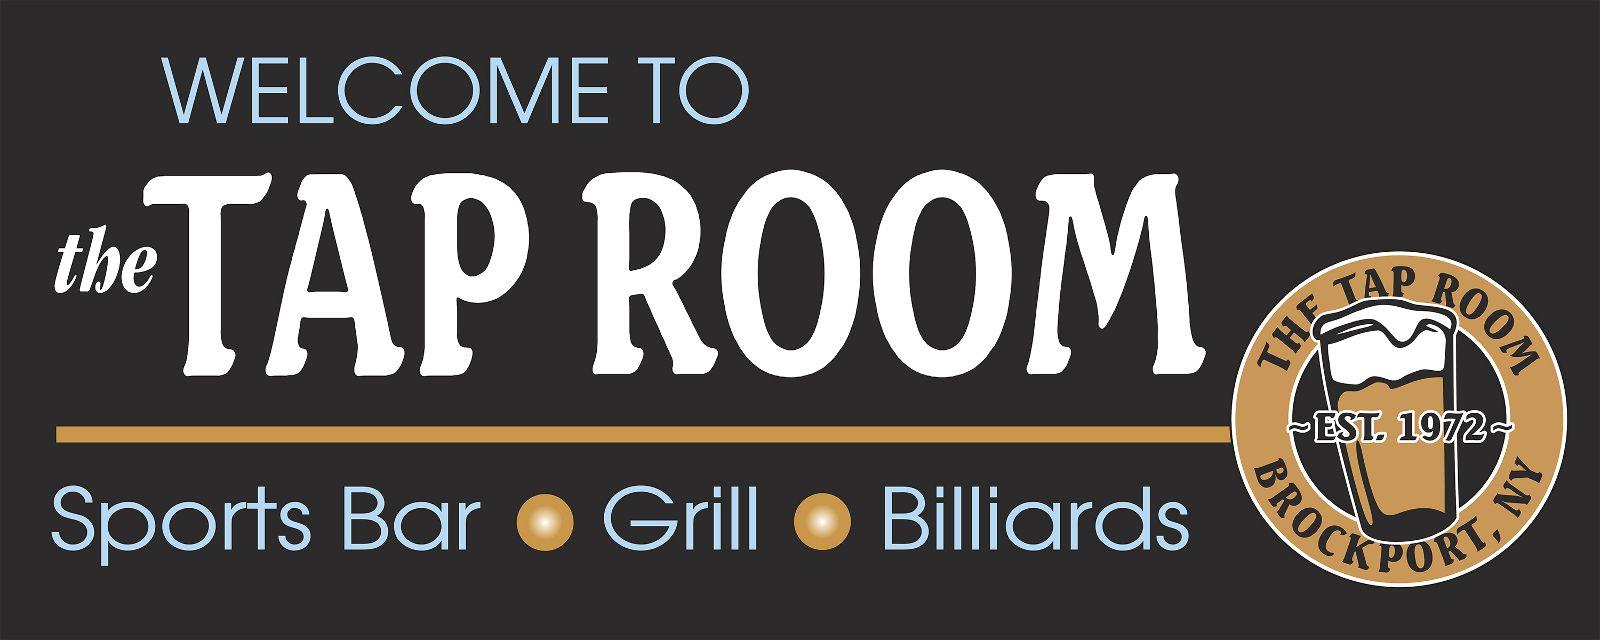 Tap Room Brockport Menu